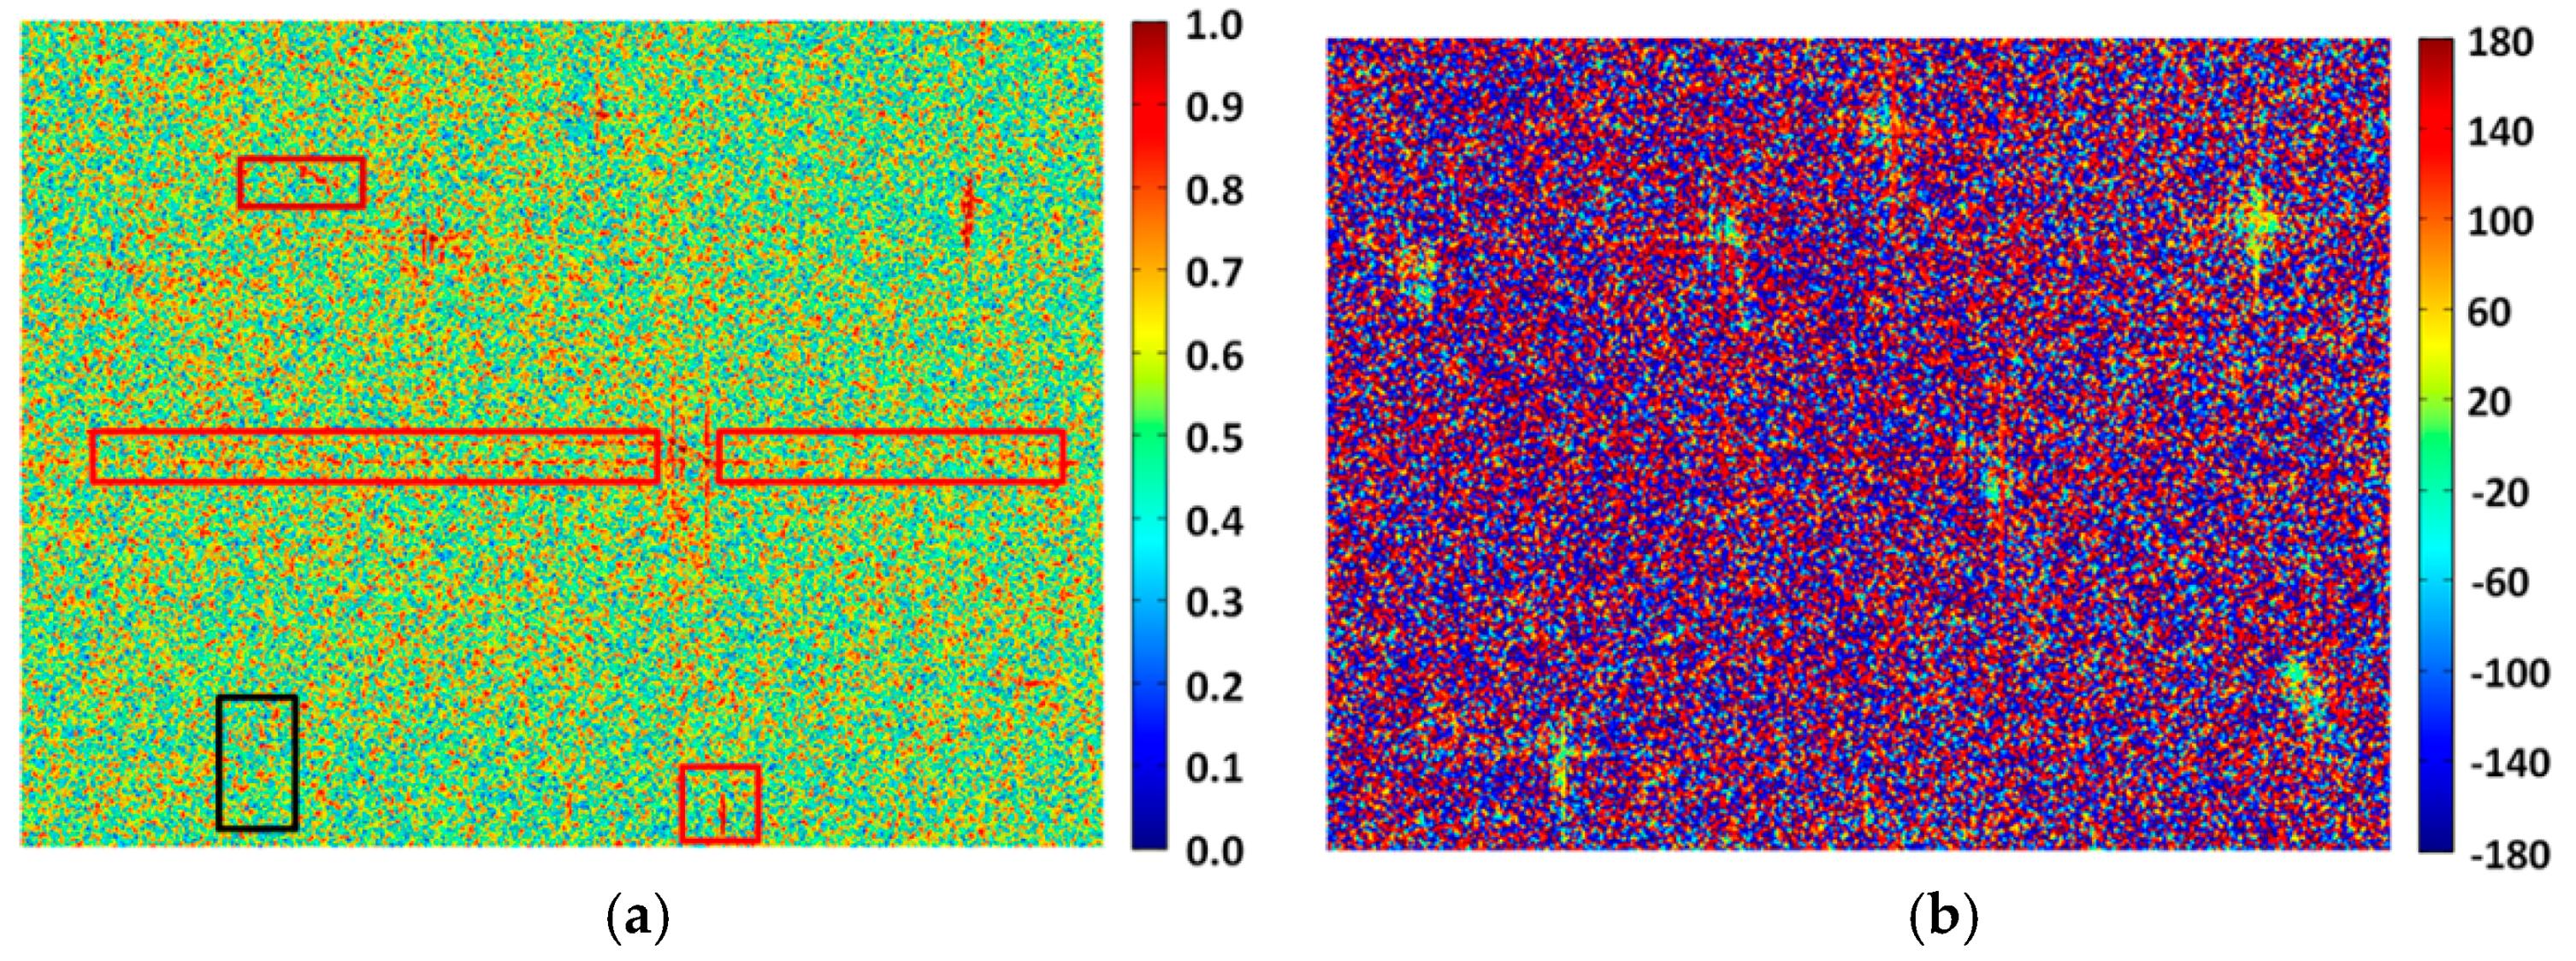 Polarimetric Detection, Characterization and Remote Sensing -